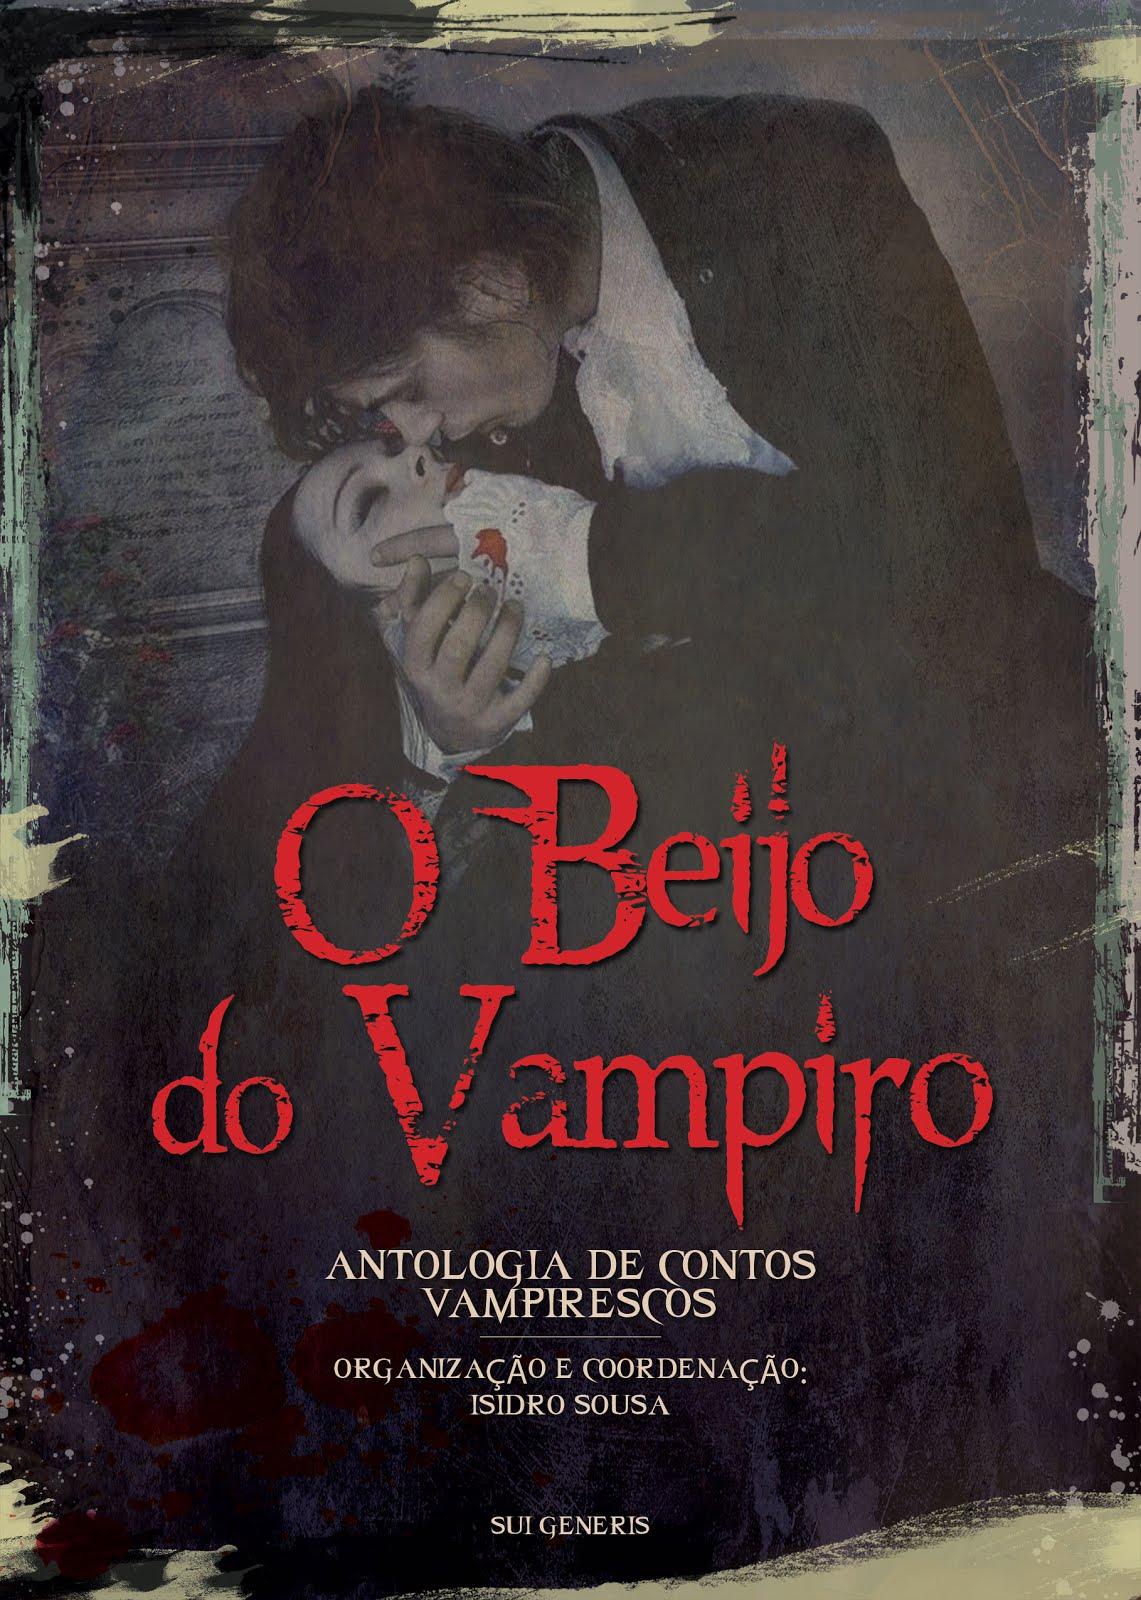 Organizei, Coordenei e Editei «O BEIJO DO VAMPIRO», que inclui o meu conto «A ODISSEIA DE DIOGO»